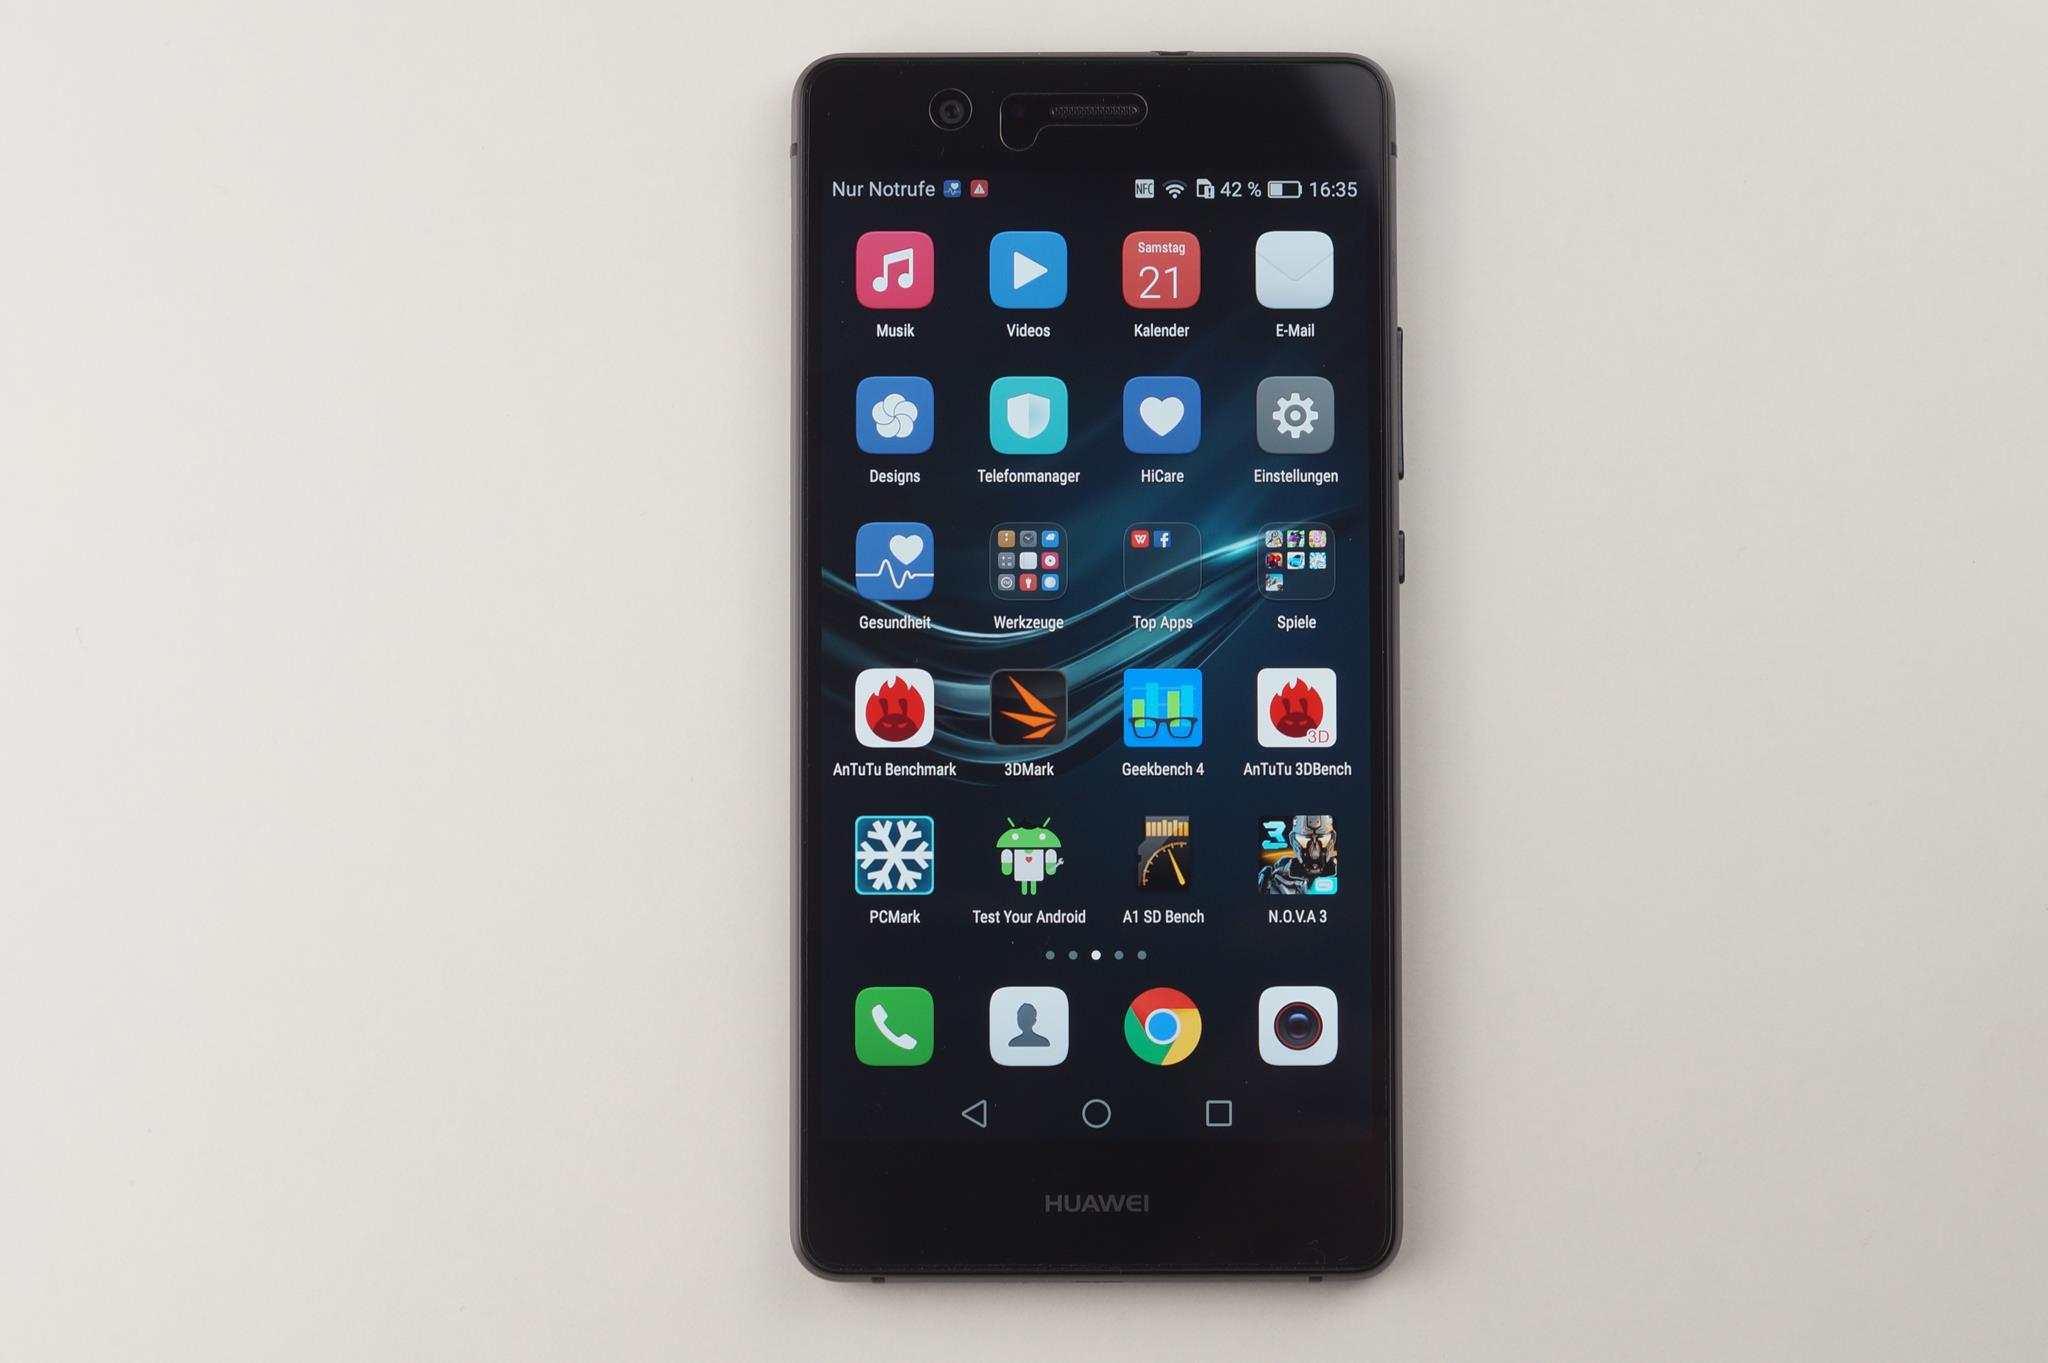 Huawei P9 Lite Display